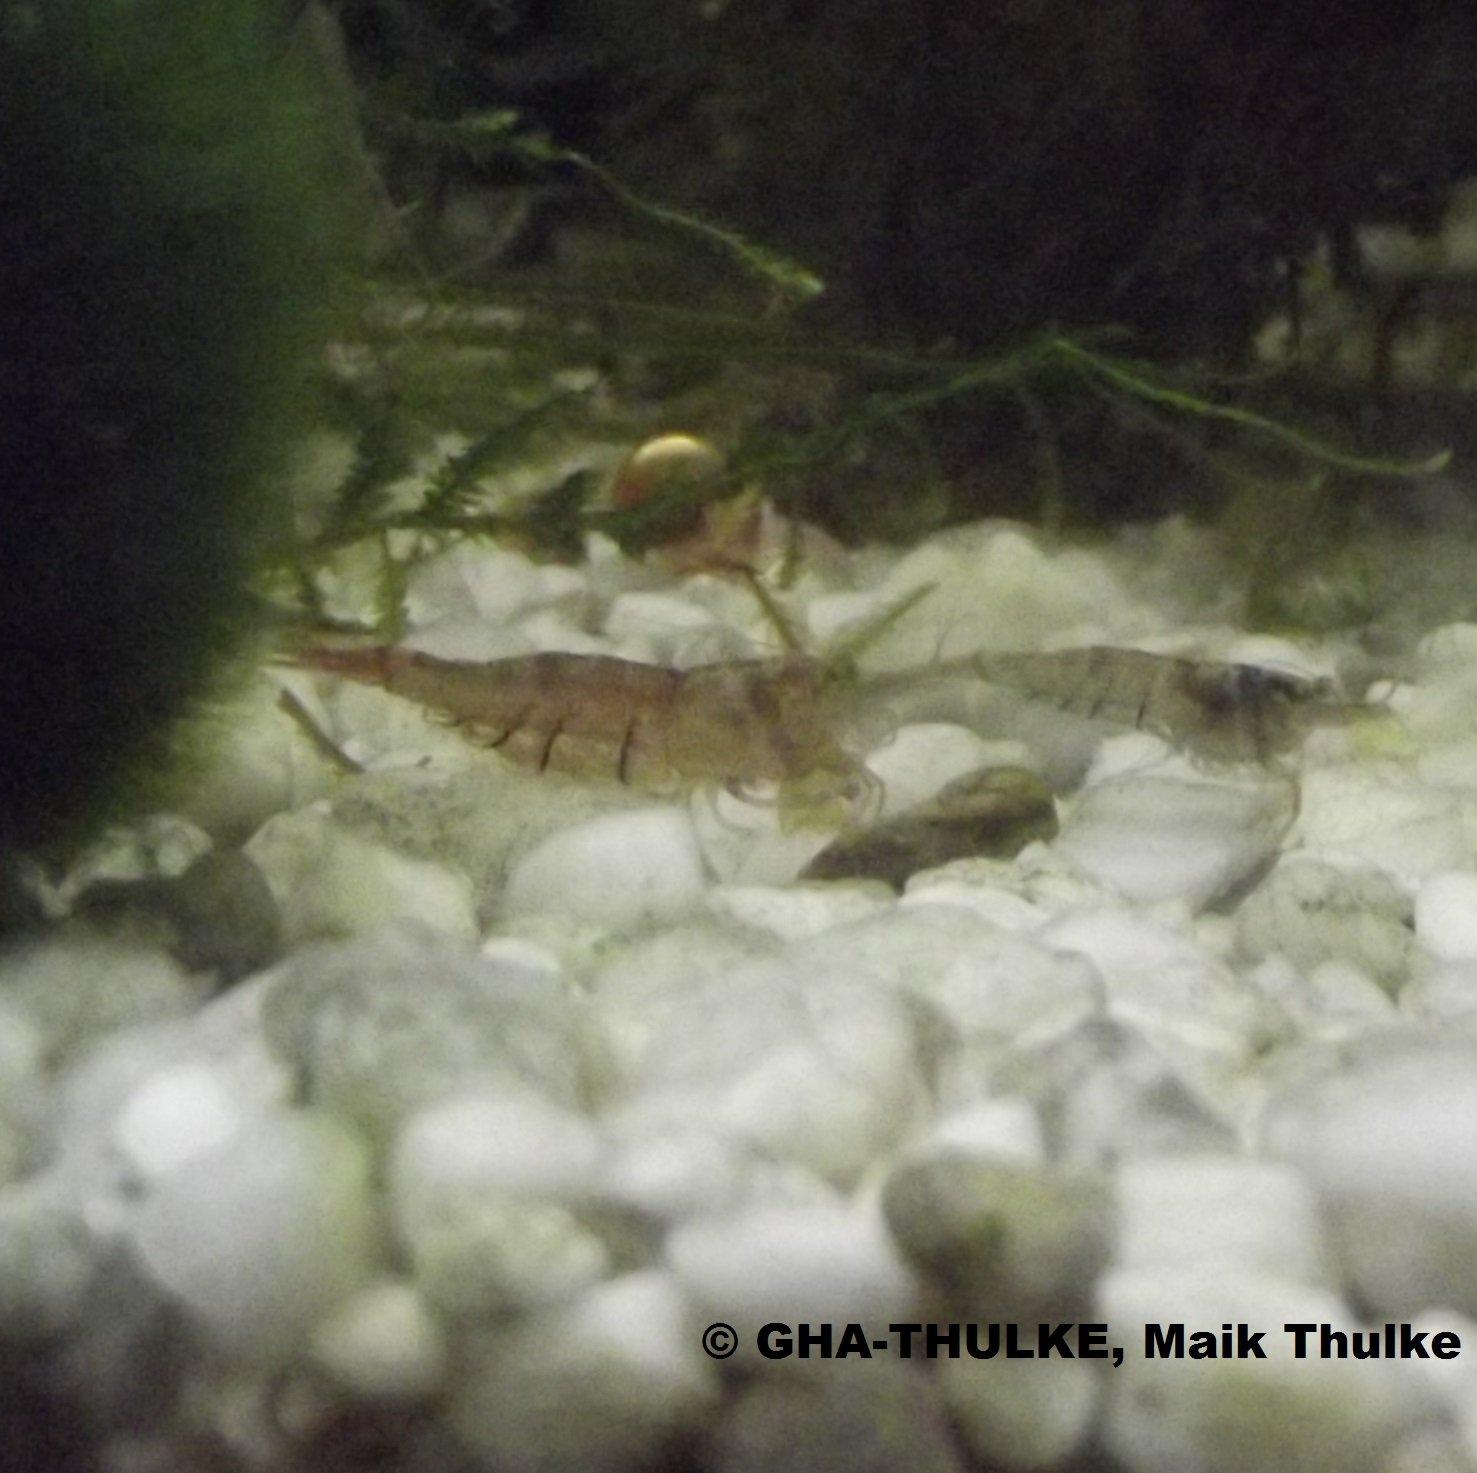 NSulawesi Inlandsgarnele - Caridina pareparensis parvidentata 5 Tiere GHA-Thulke